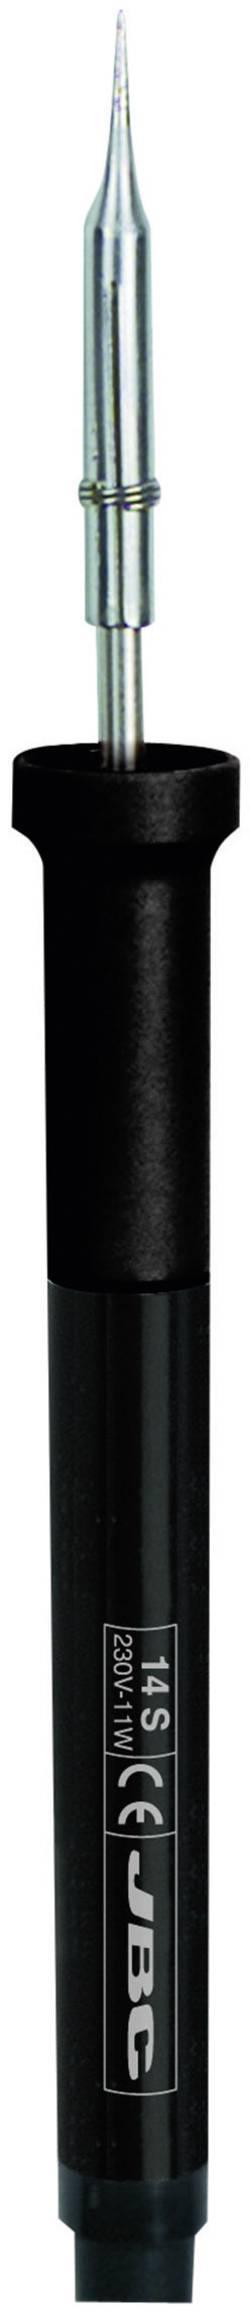 Fer à souder JBC 14S 11 W +340 °C (max)